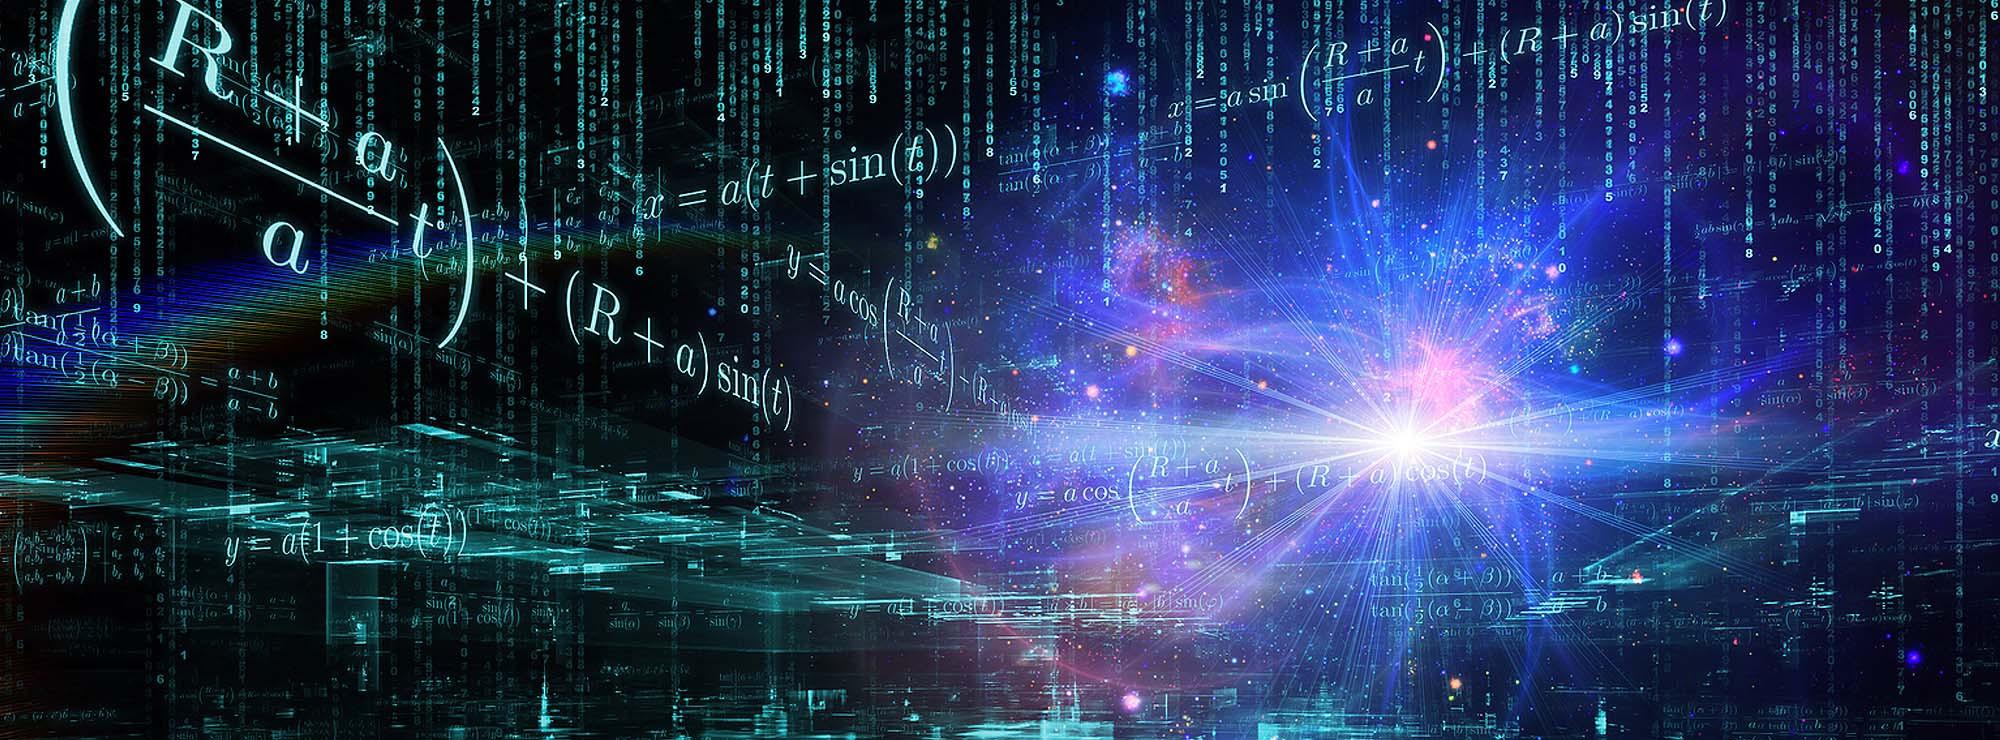 1503649697_articlequantumcrypto.jpg